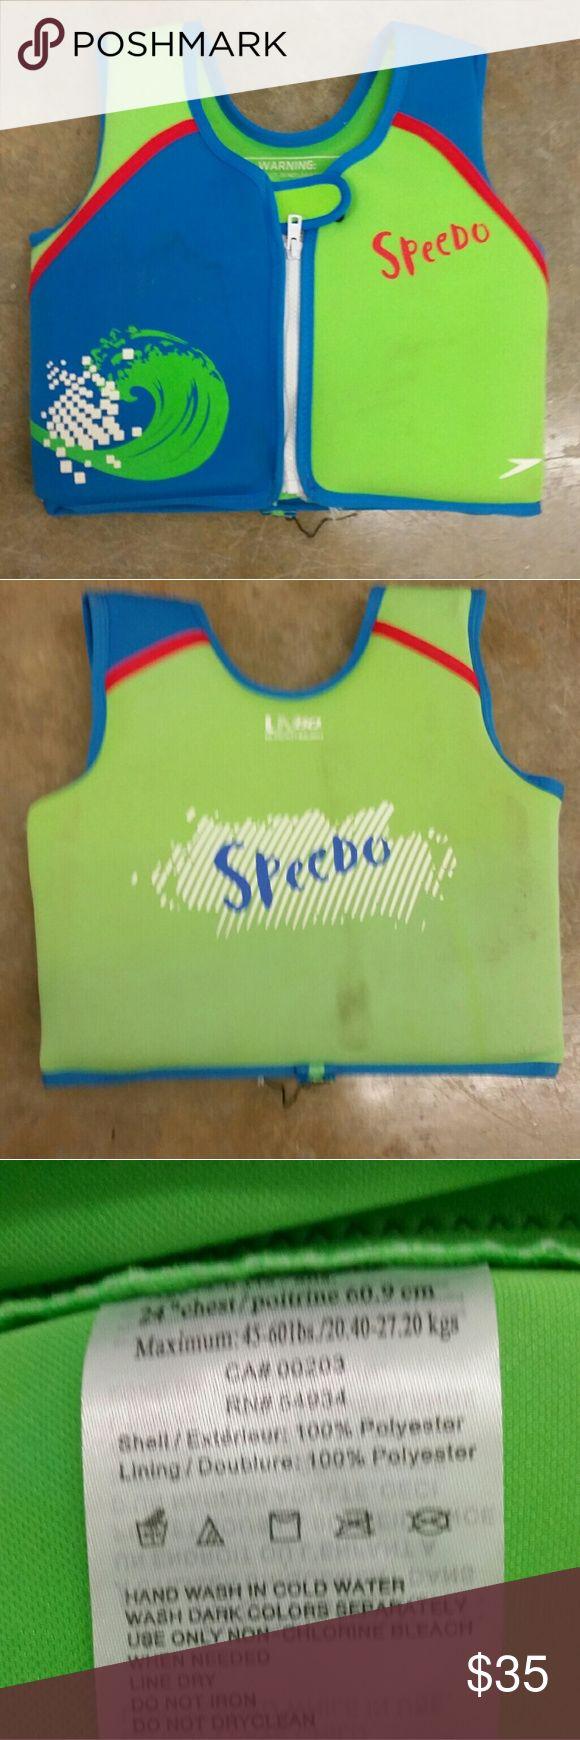 Speedo Neoprene Life Jacket Child Size  45-60 lbs Speedo Neoprene Life Jacket Child Size  45-60 lbs Speedo Swim